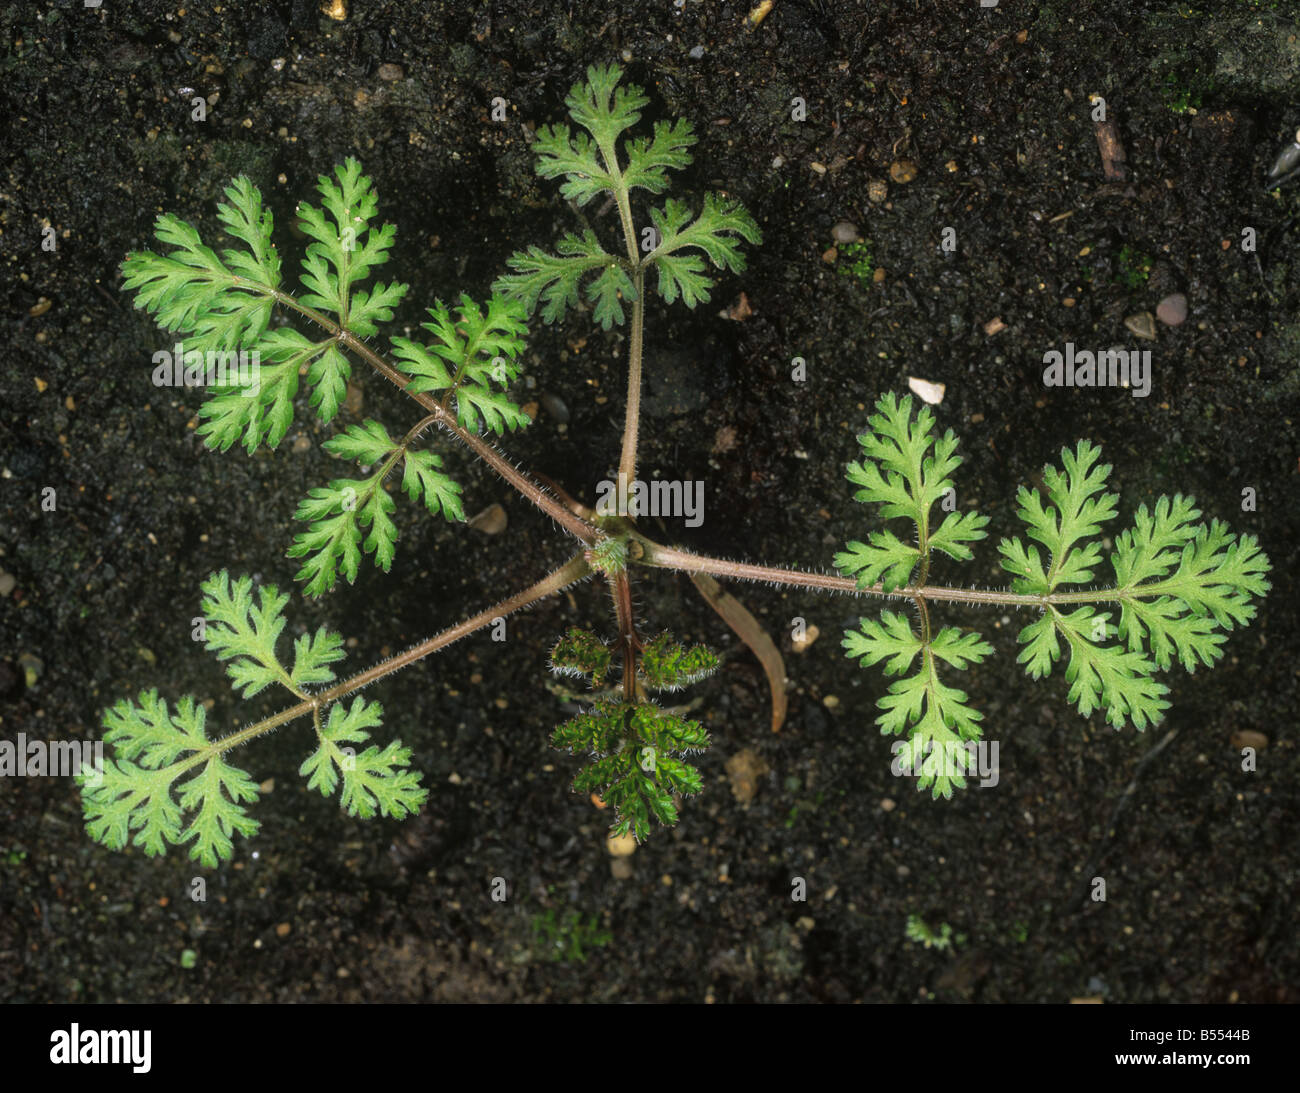 Small bur parsley Caucalis platycarpos young plant - Stock Image